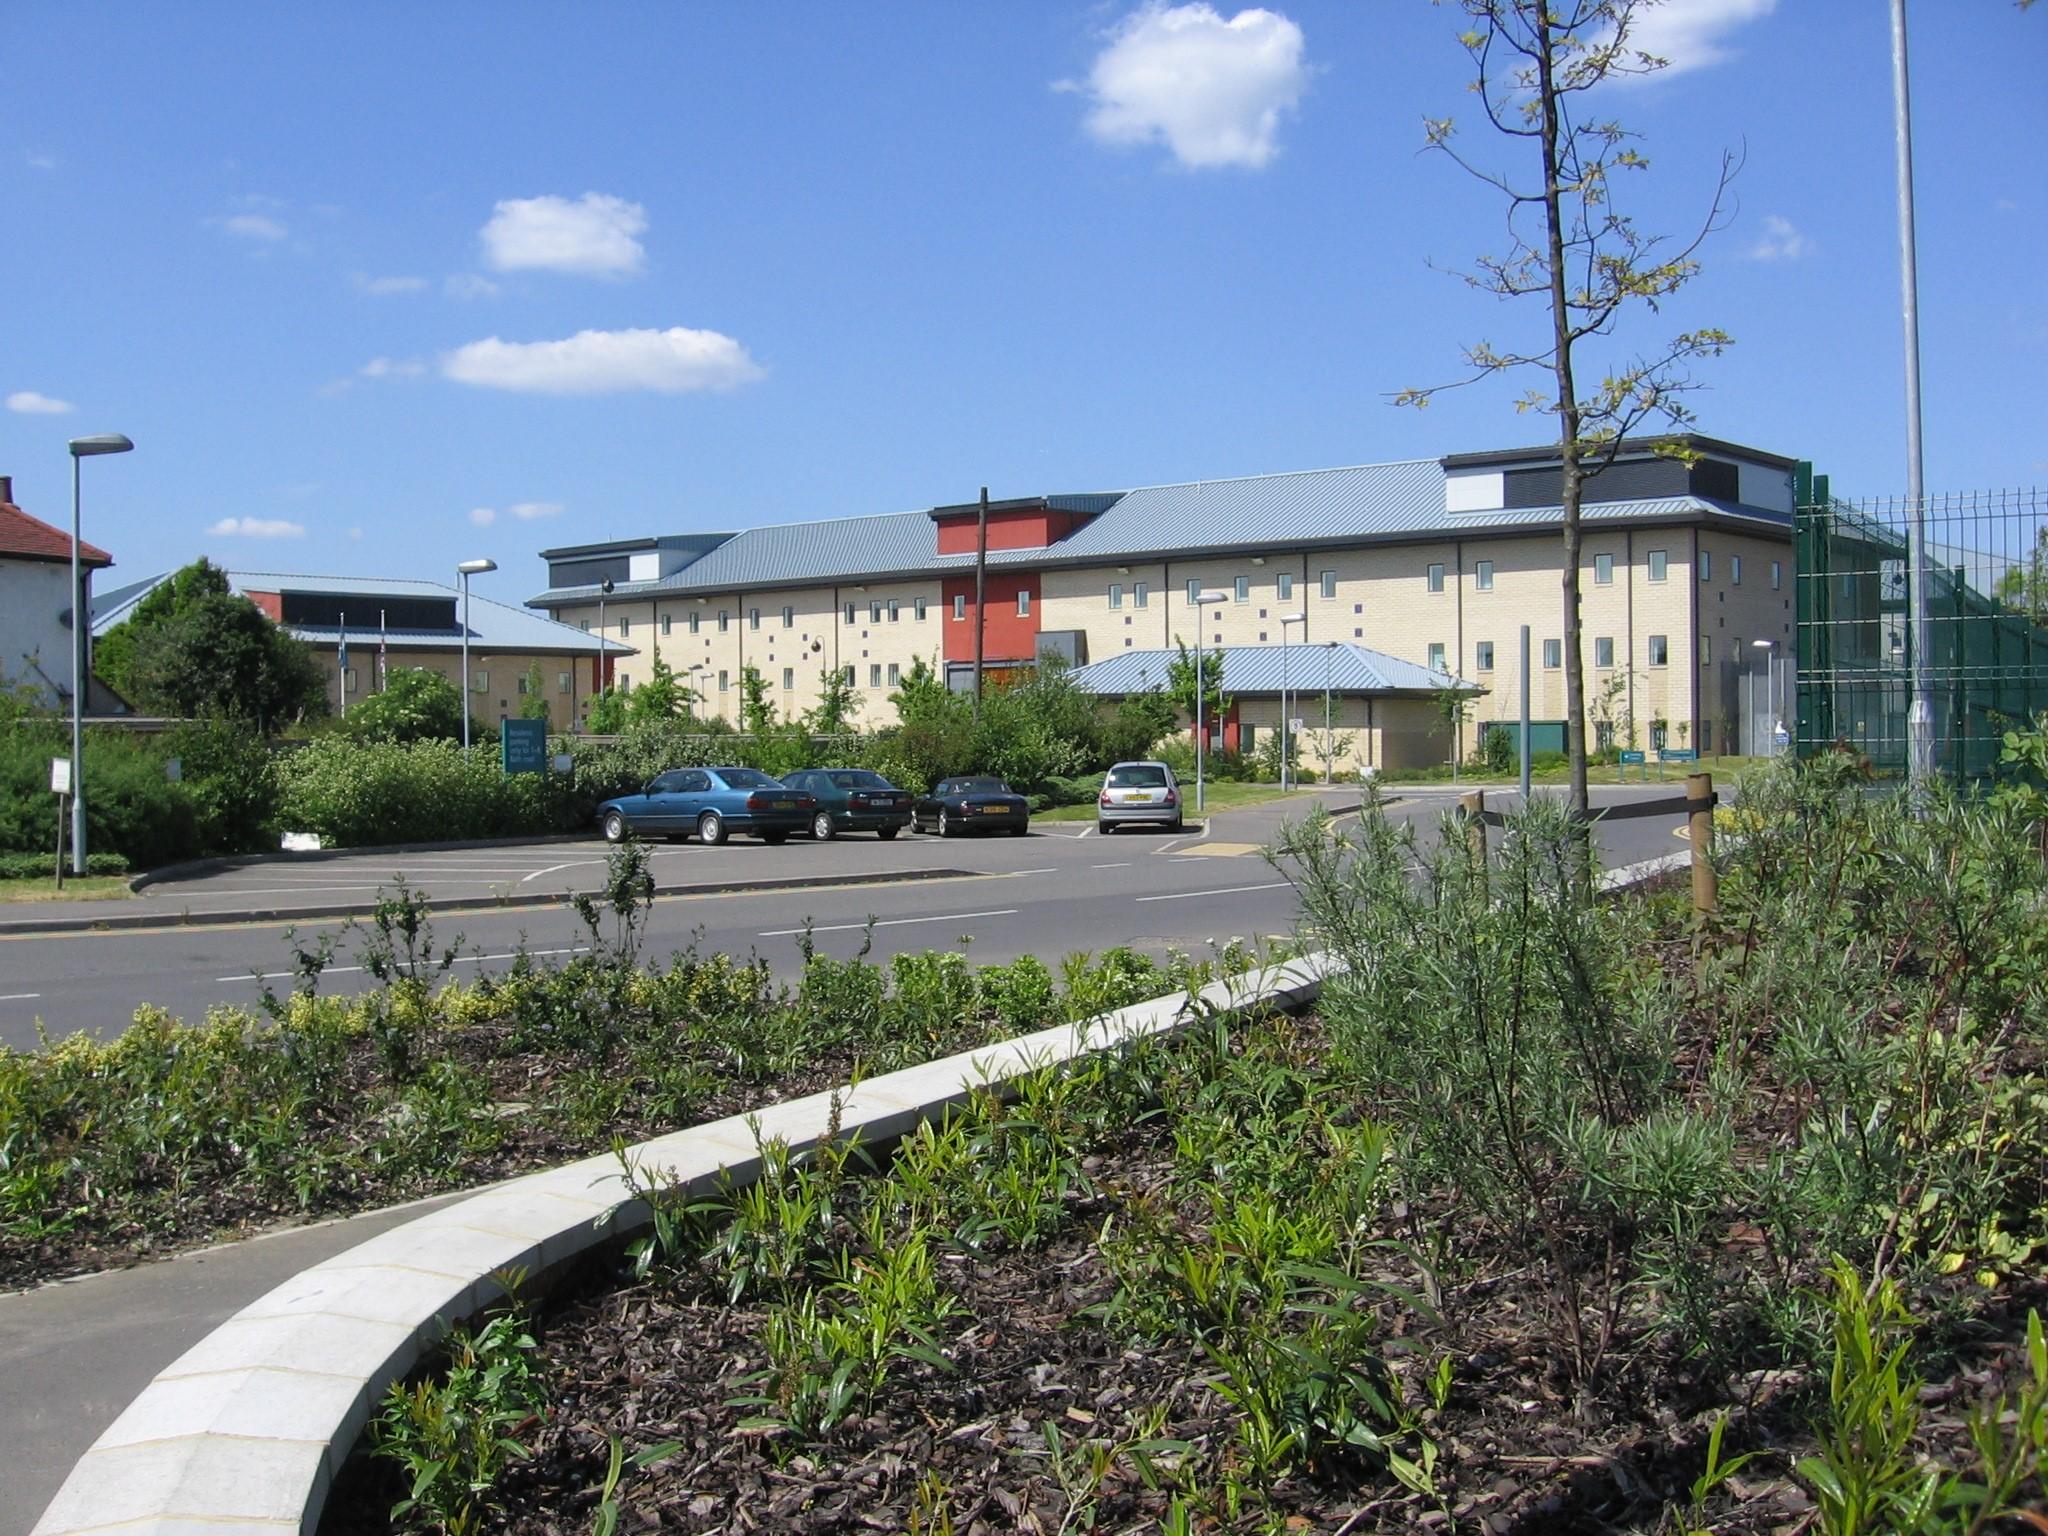 Harmondsworth Immigration Removal Centre (United Kingdom)